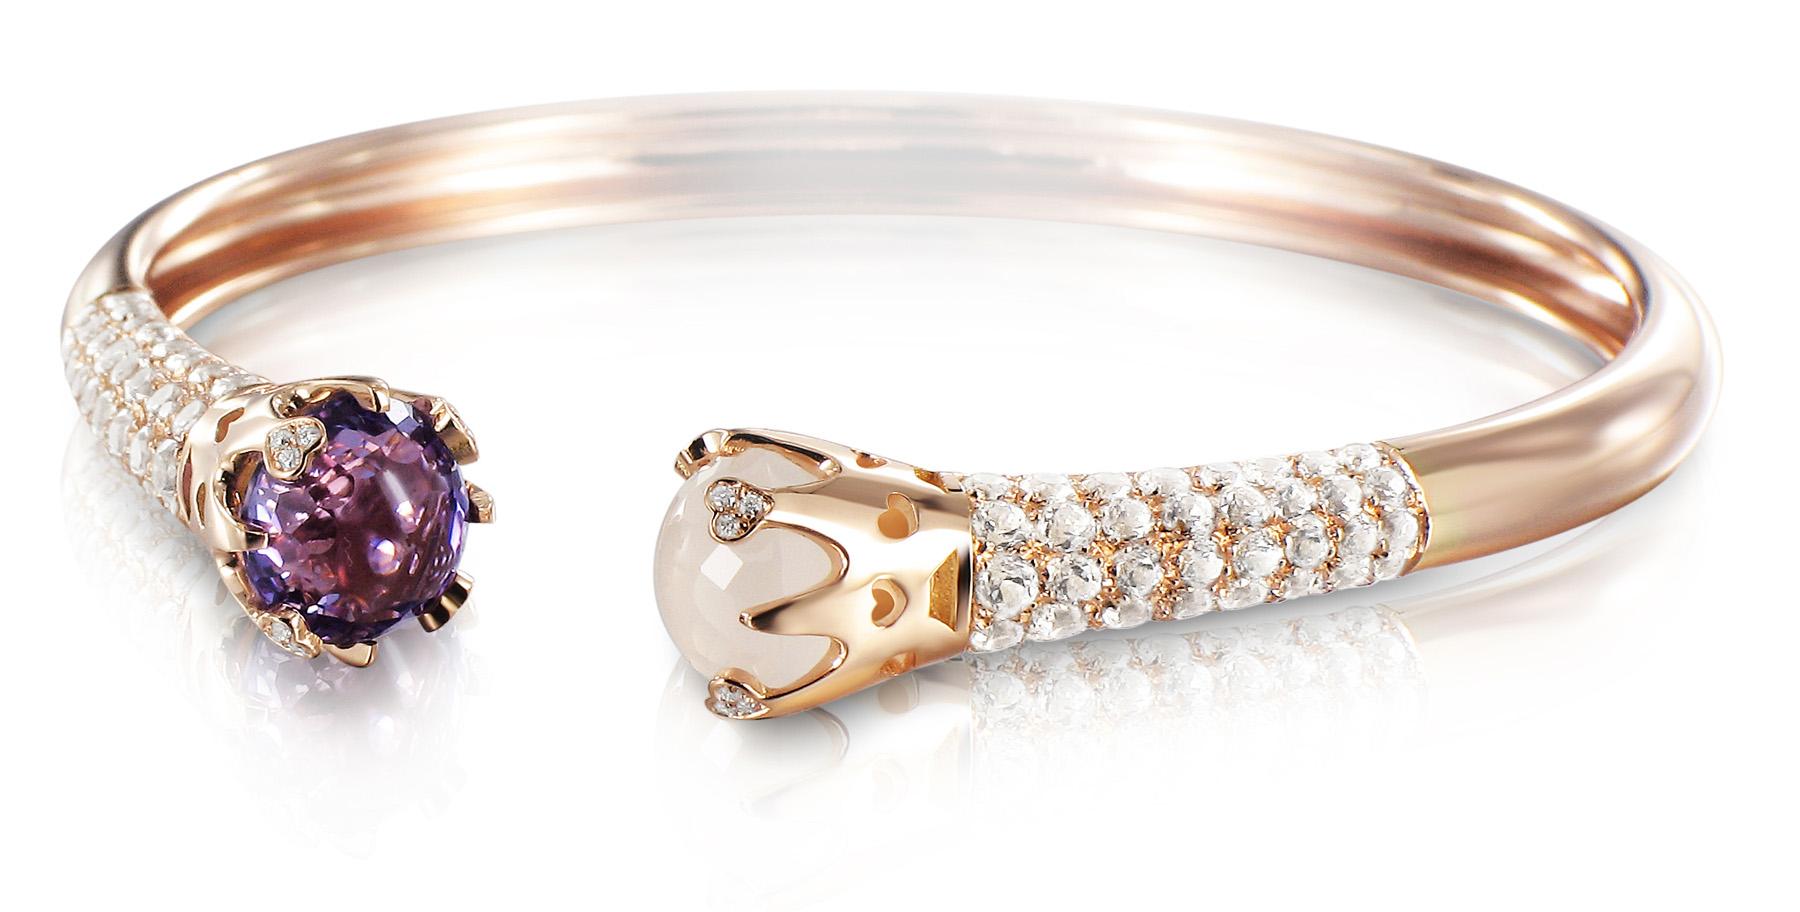 Sissi Io Amo_bracelet_14642R.jpg